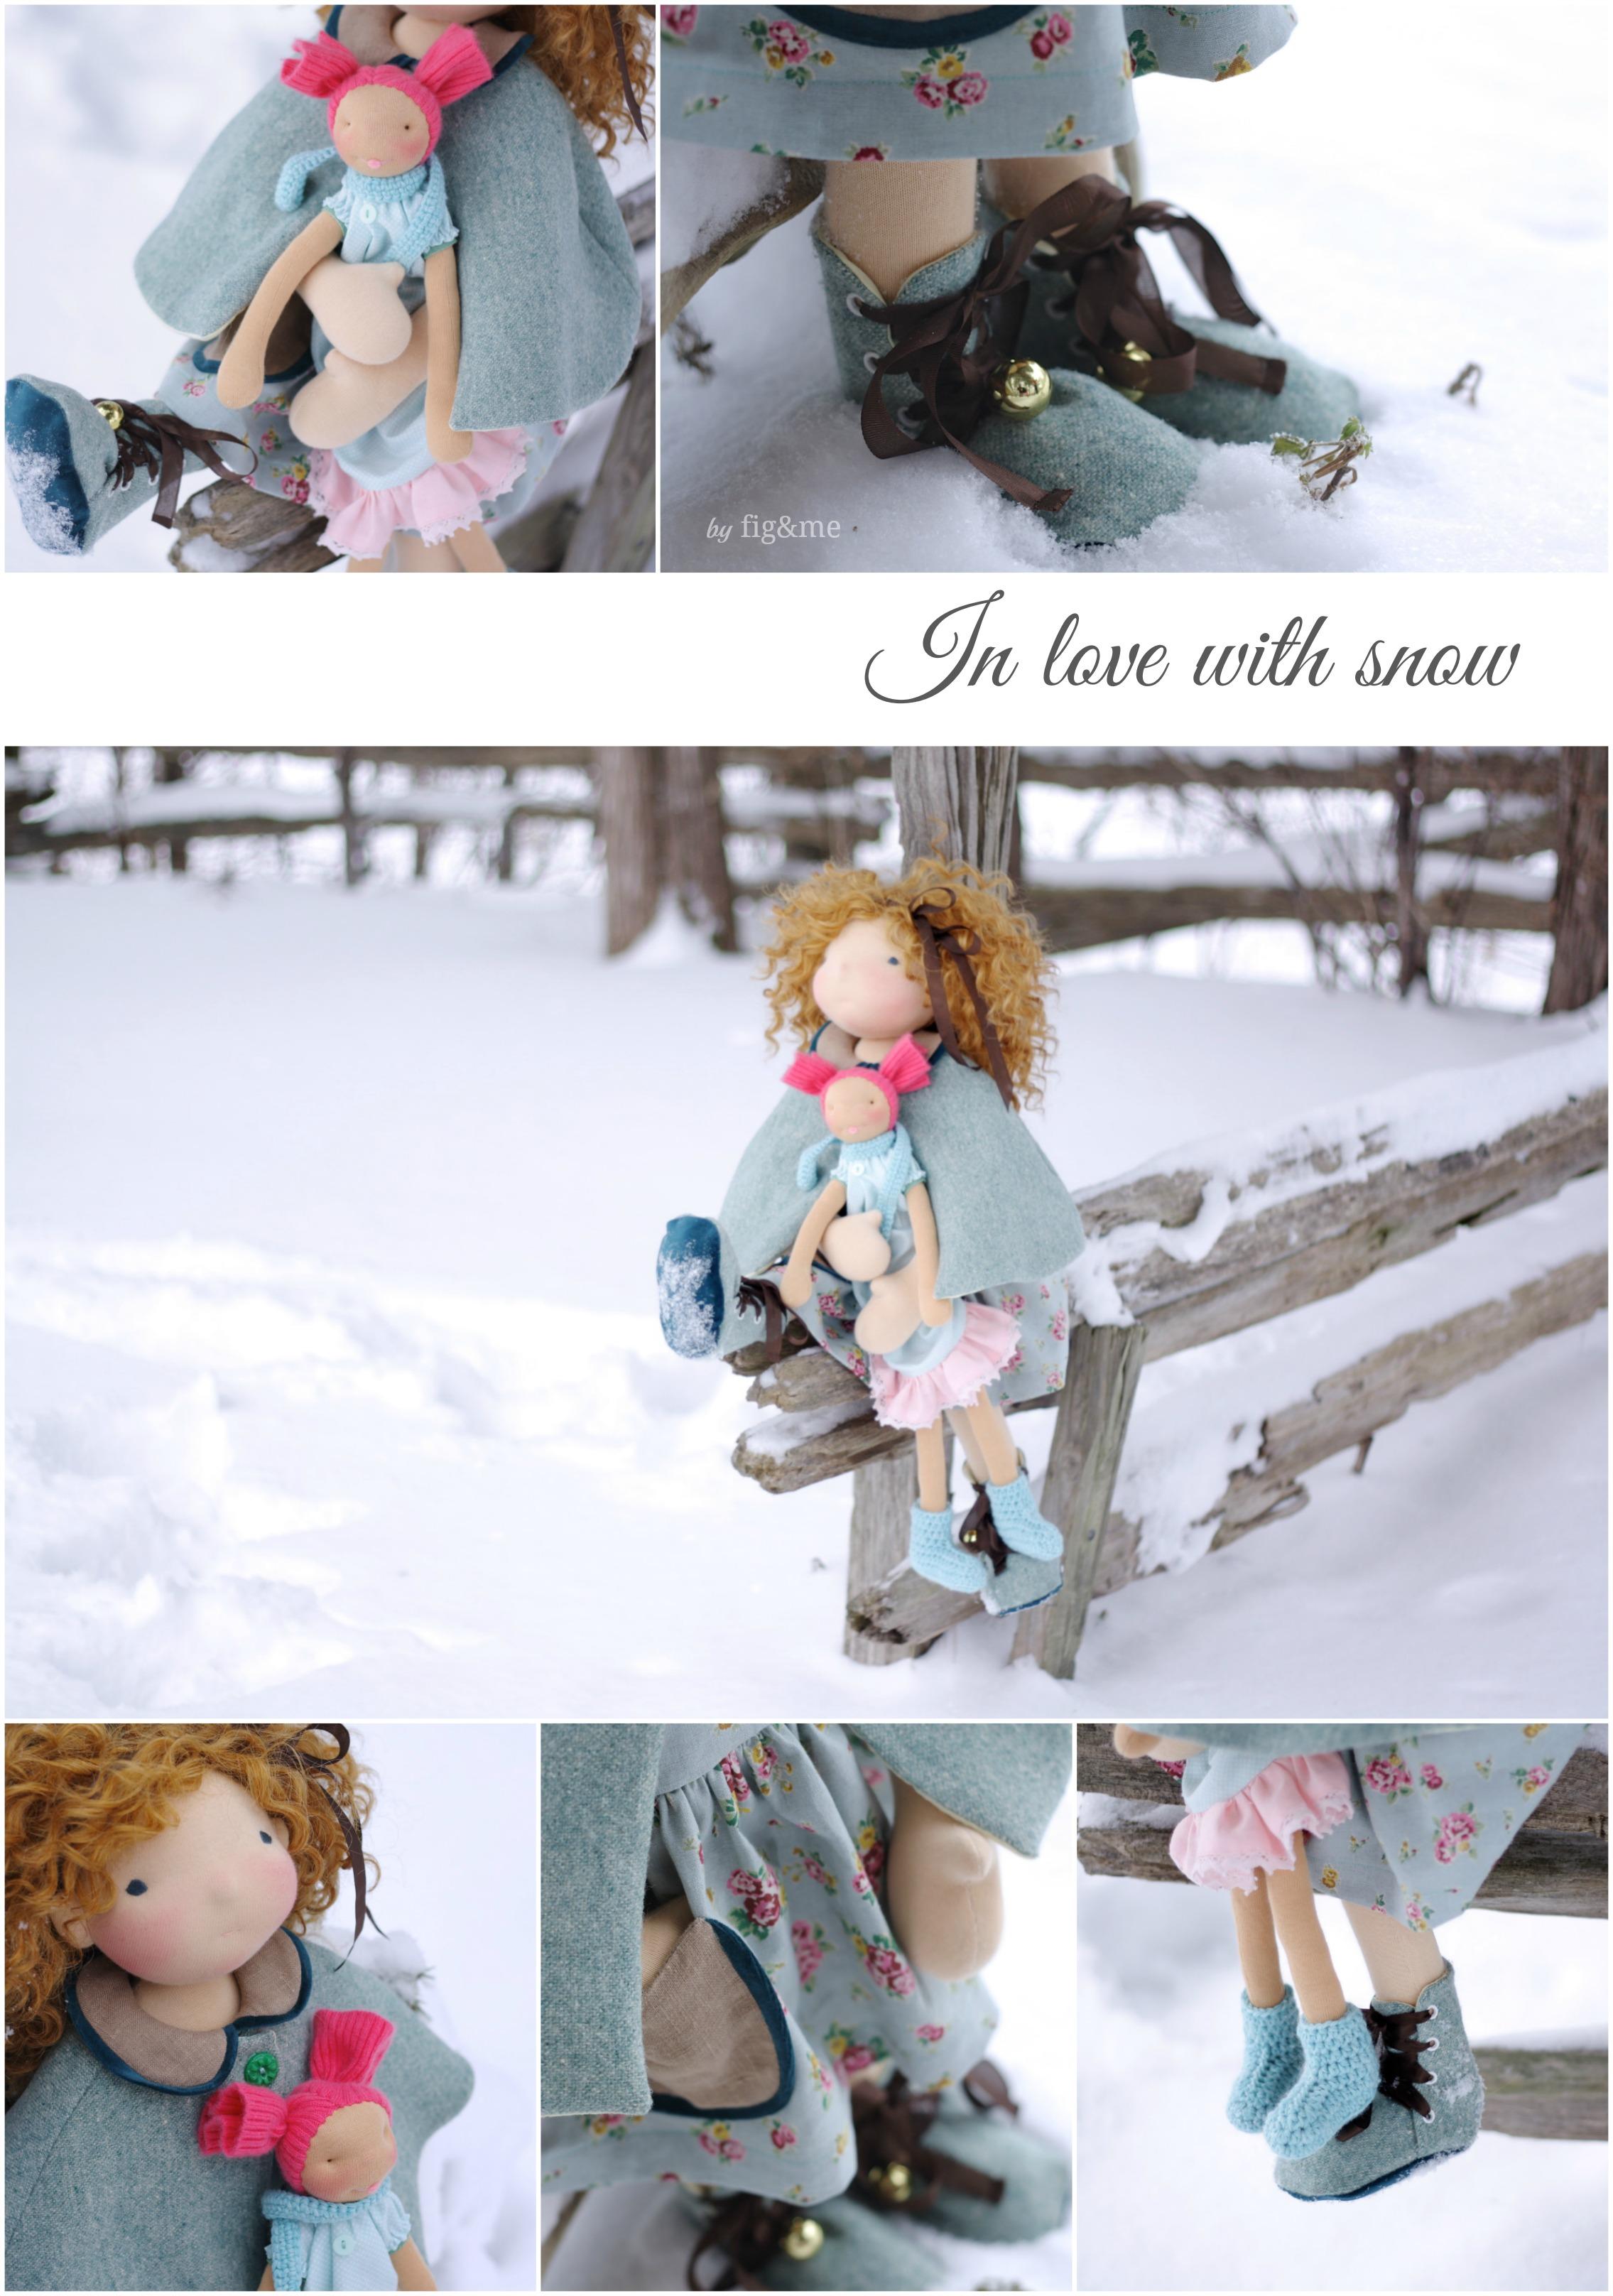 We love snow! by Fig&me.